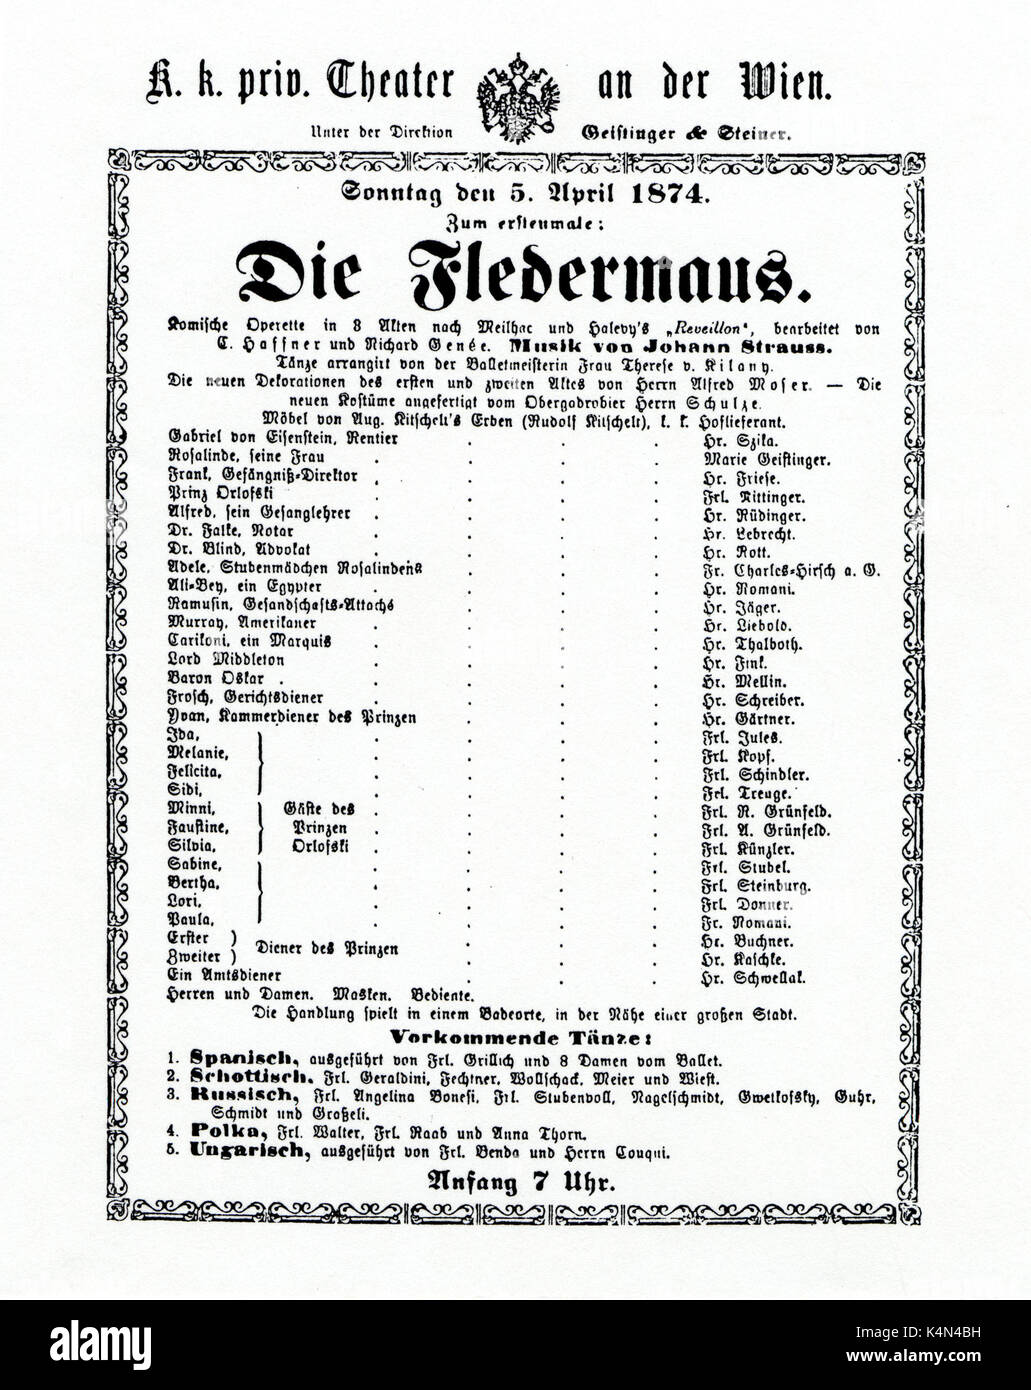 STRAUSS,Johann II. Die Fledermaus- Programme from Theater an der Wien Sunday 5th April 1874 premiere with Geistinger etc. - Stock Image